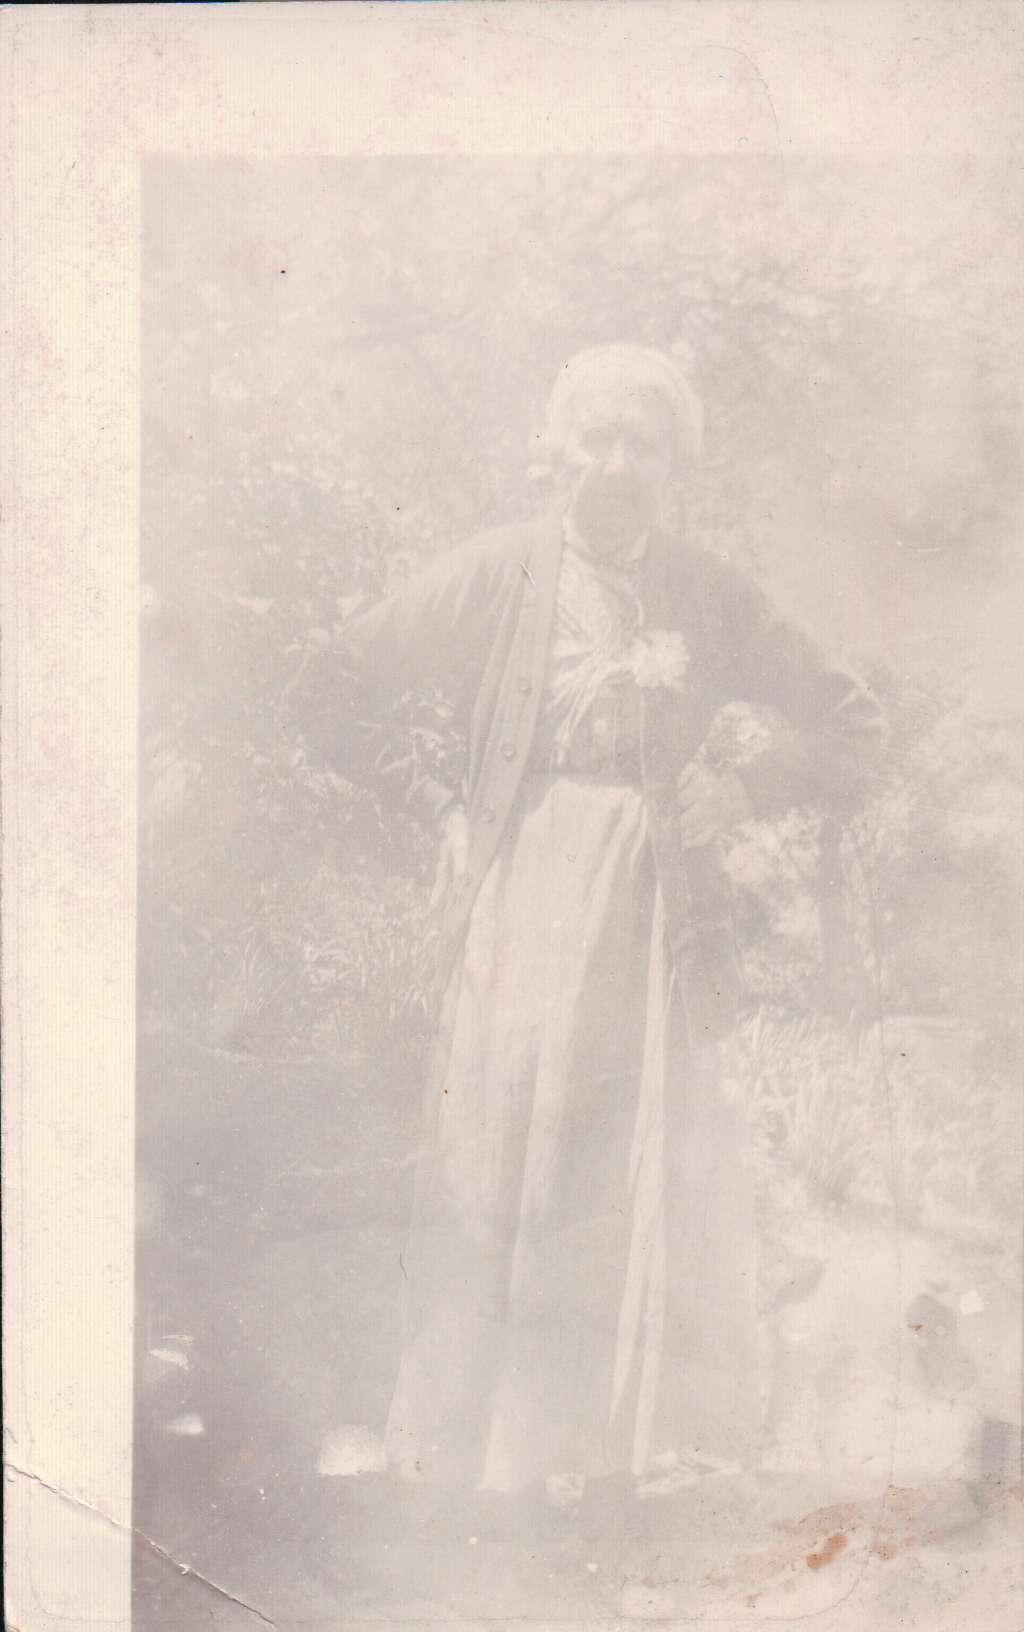 Catharine (Fisher) Clapper Hawn (1847-1934)